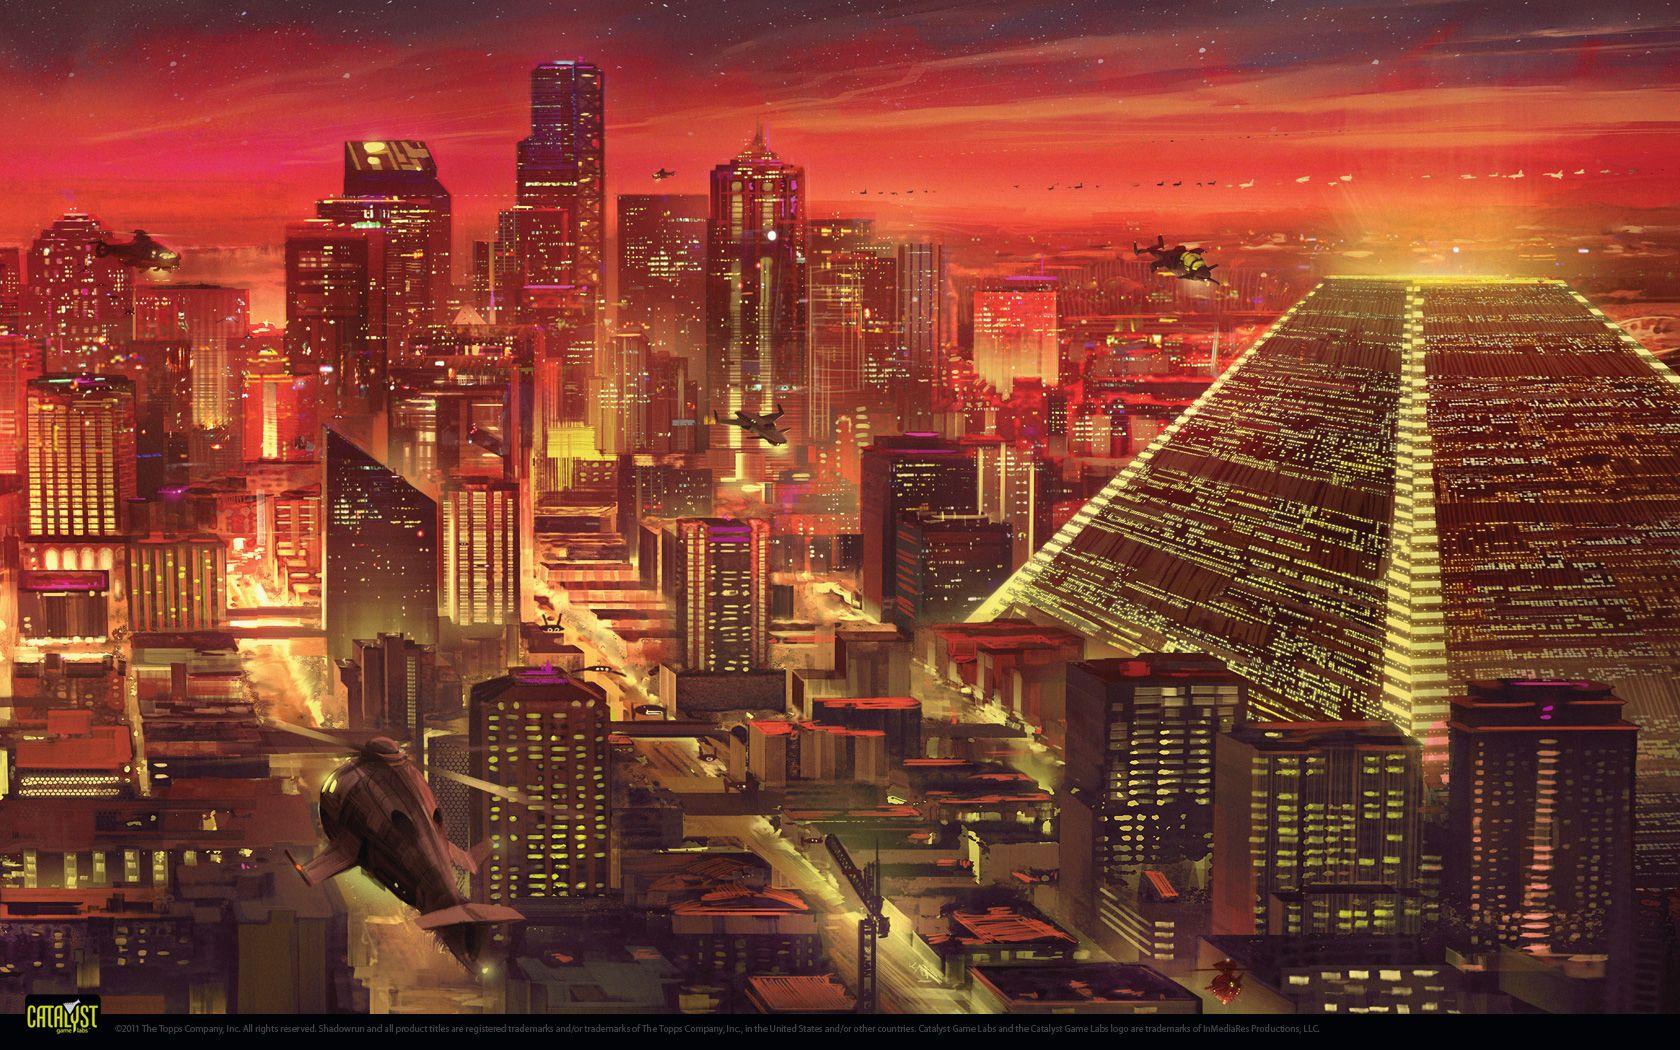 Wallpapers Shadowrun 5 Shadowrun Futuristic City Cyberpunk City